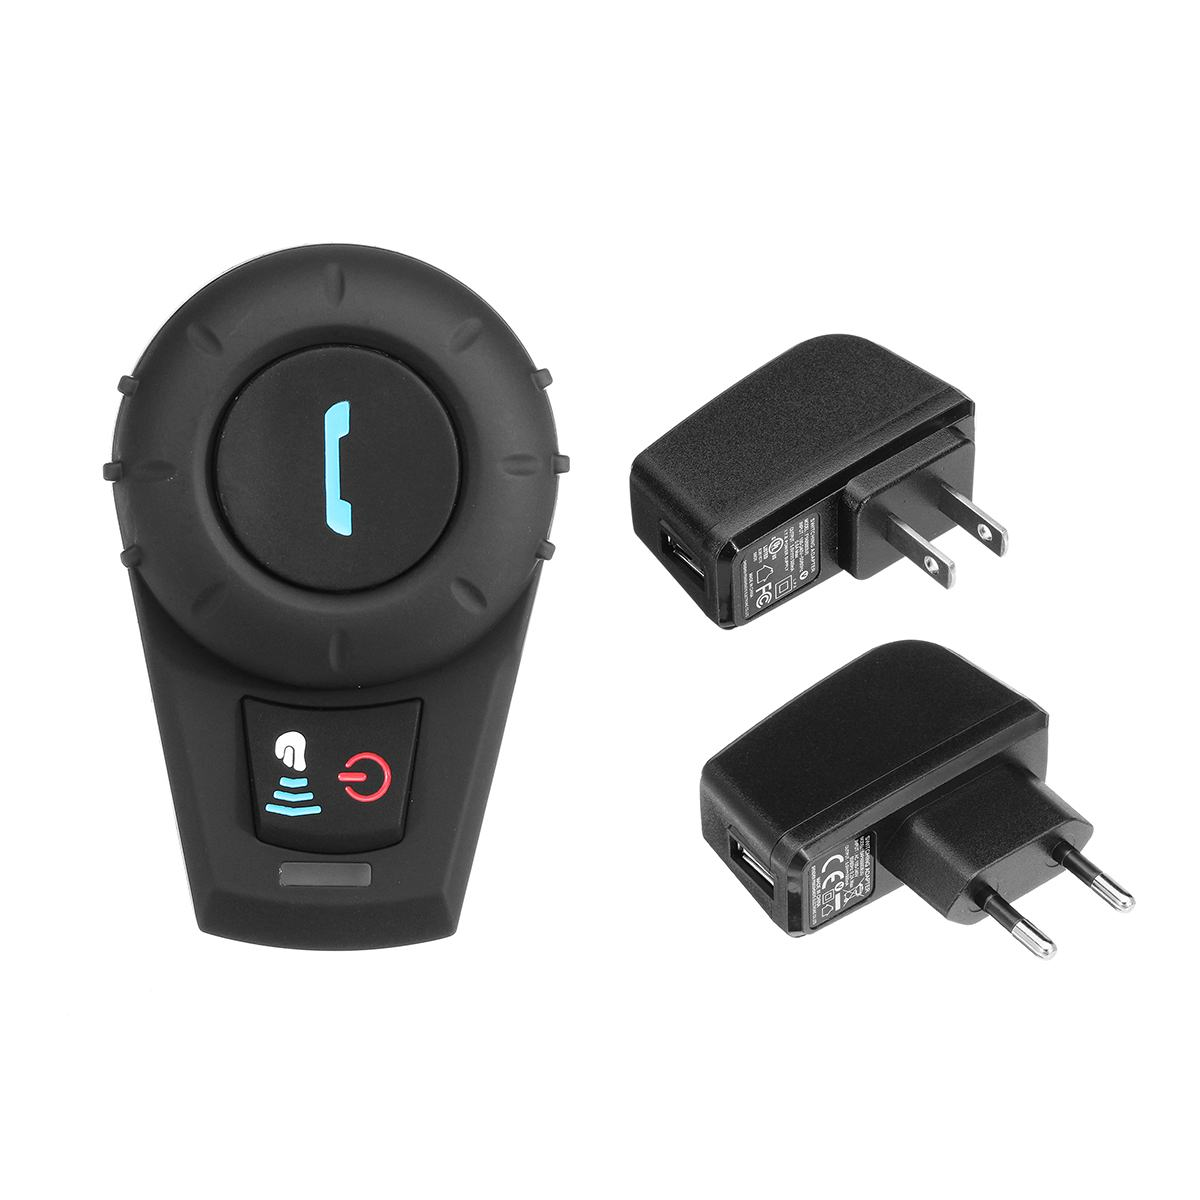 Motorrad Helm Intercom Bis zu 500 M Abstand Headset BT Sprech Mit bluetooth Funktion EU Oder Us-stecker